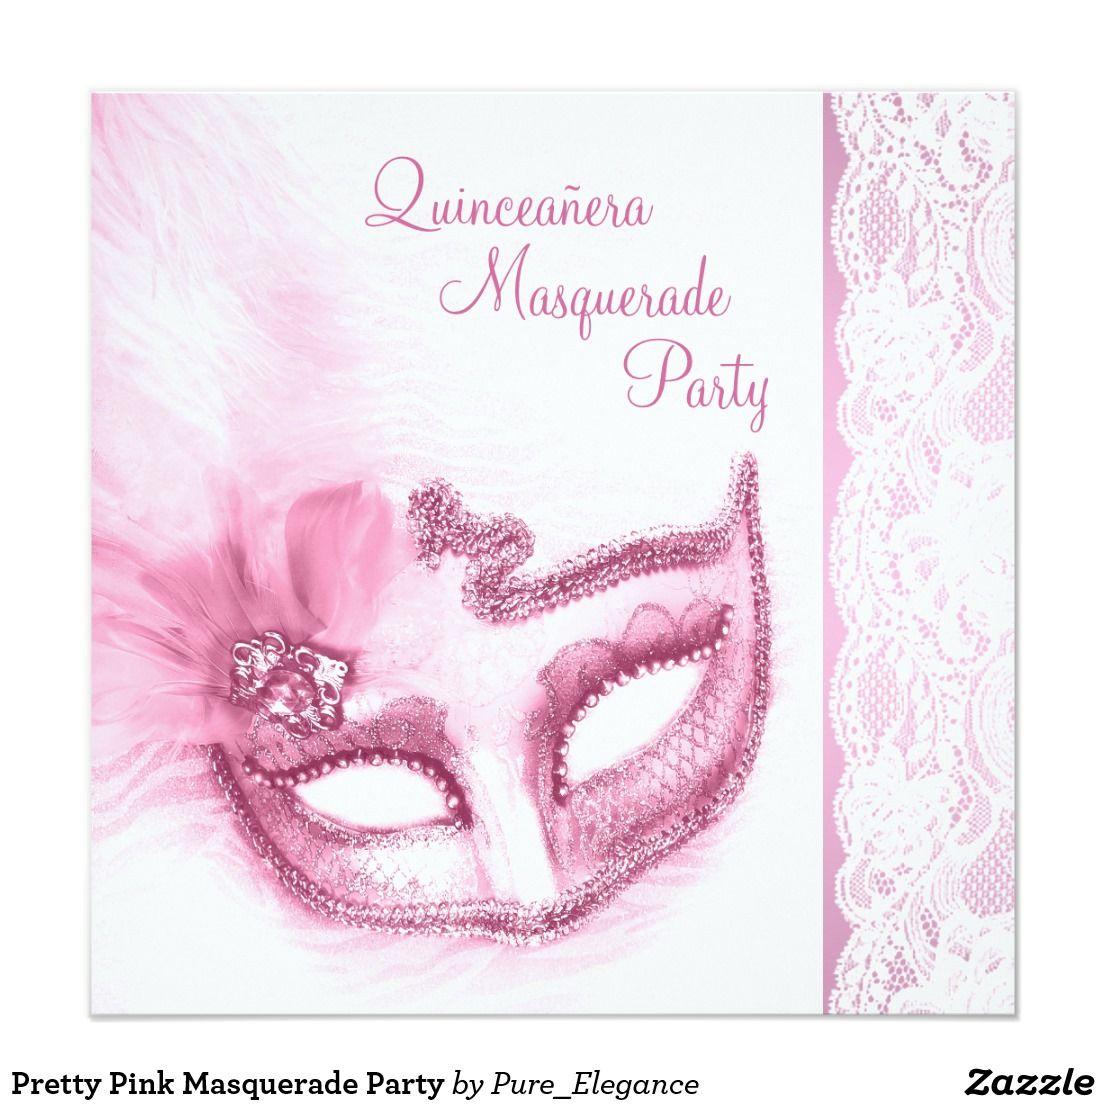 Pretty Pink Masquerade Party Card Pretty pale pink masquerade ...